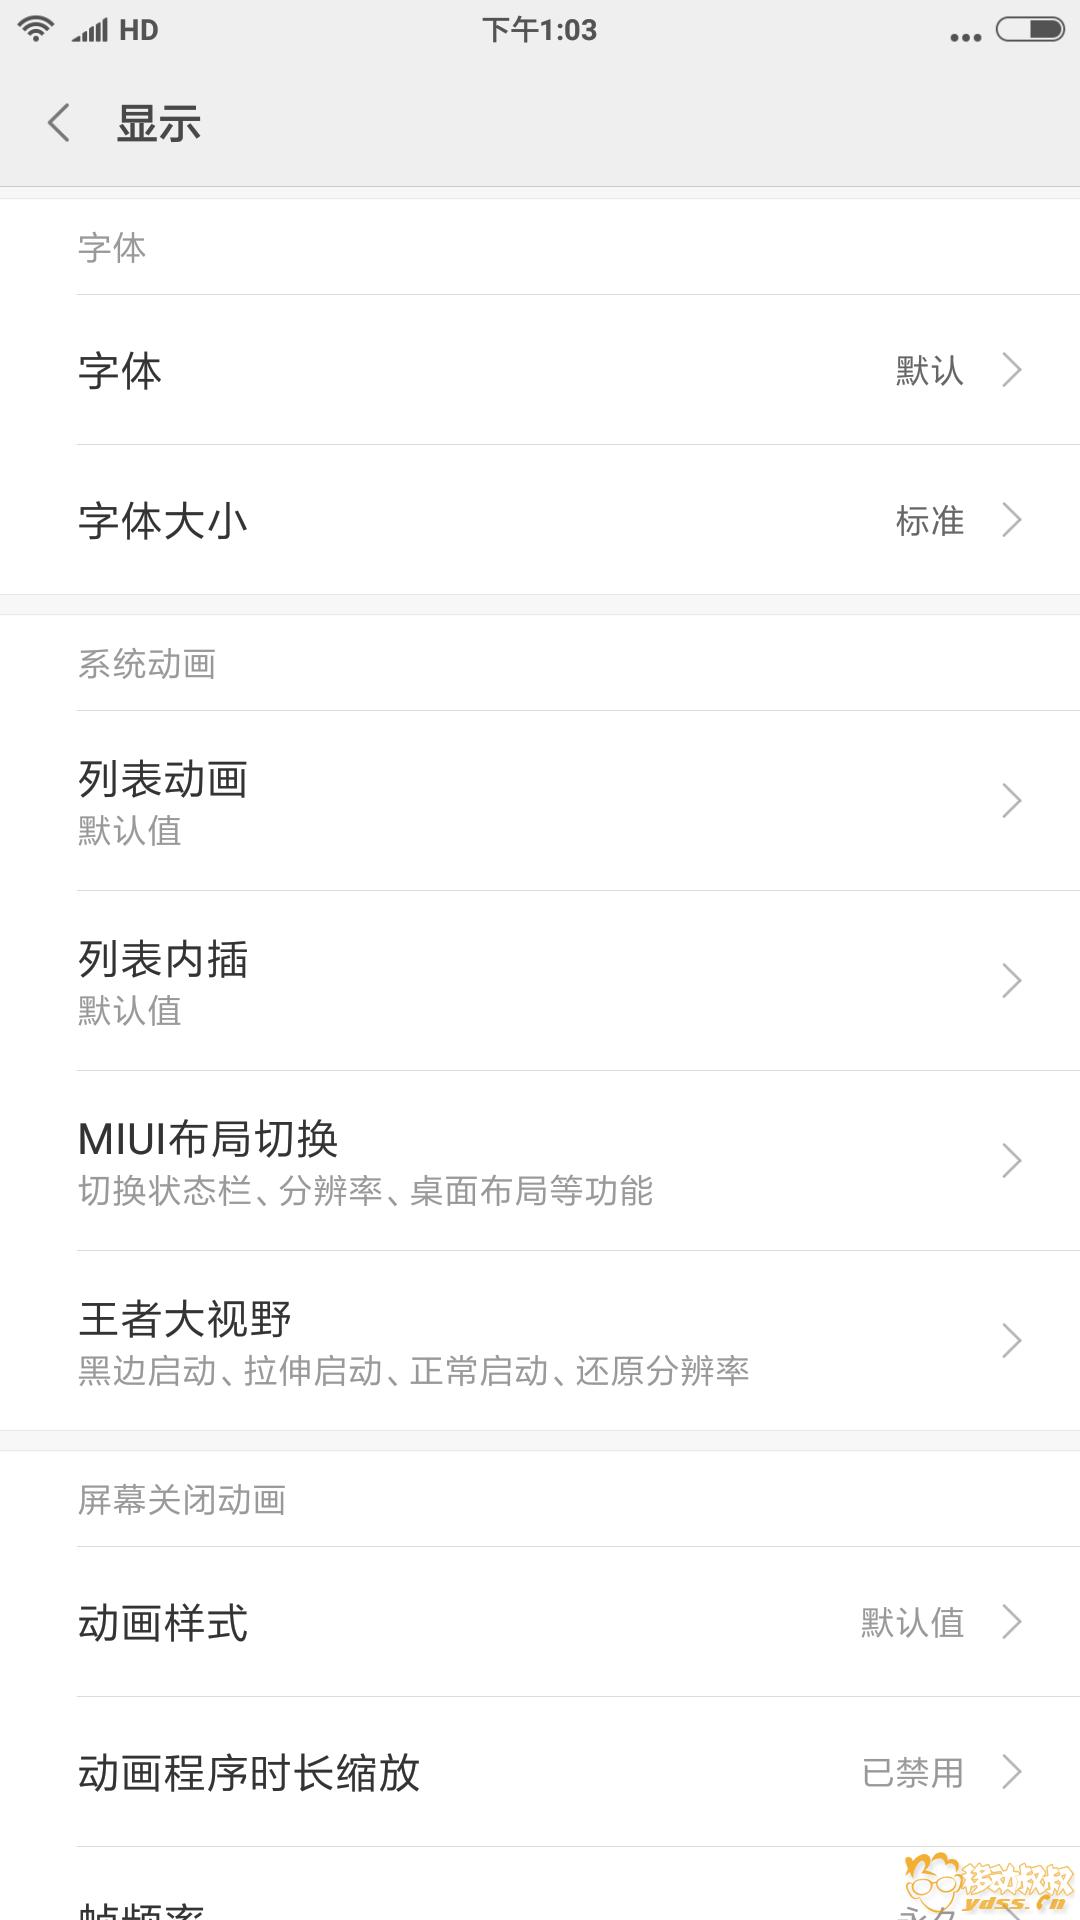 Screenshot_2018-04-04-13-03-53-563_com.android.se.png